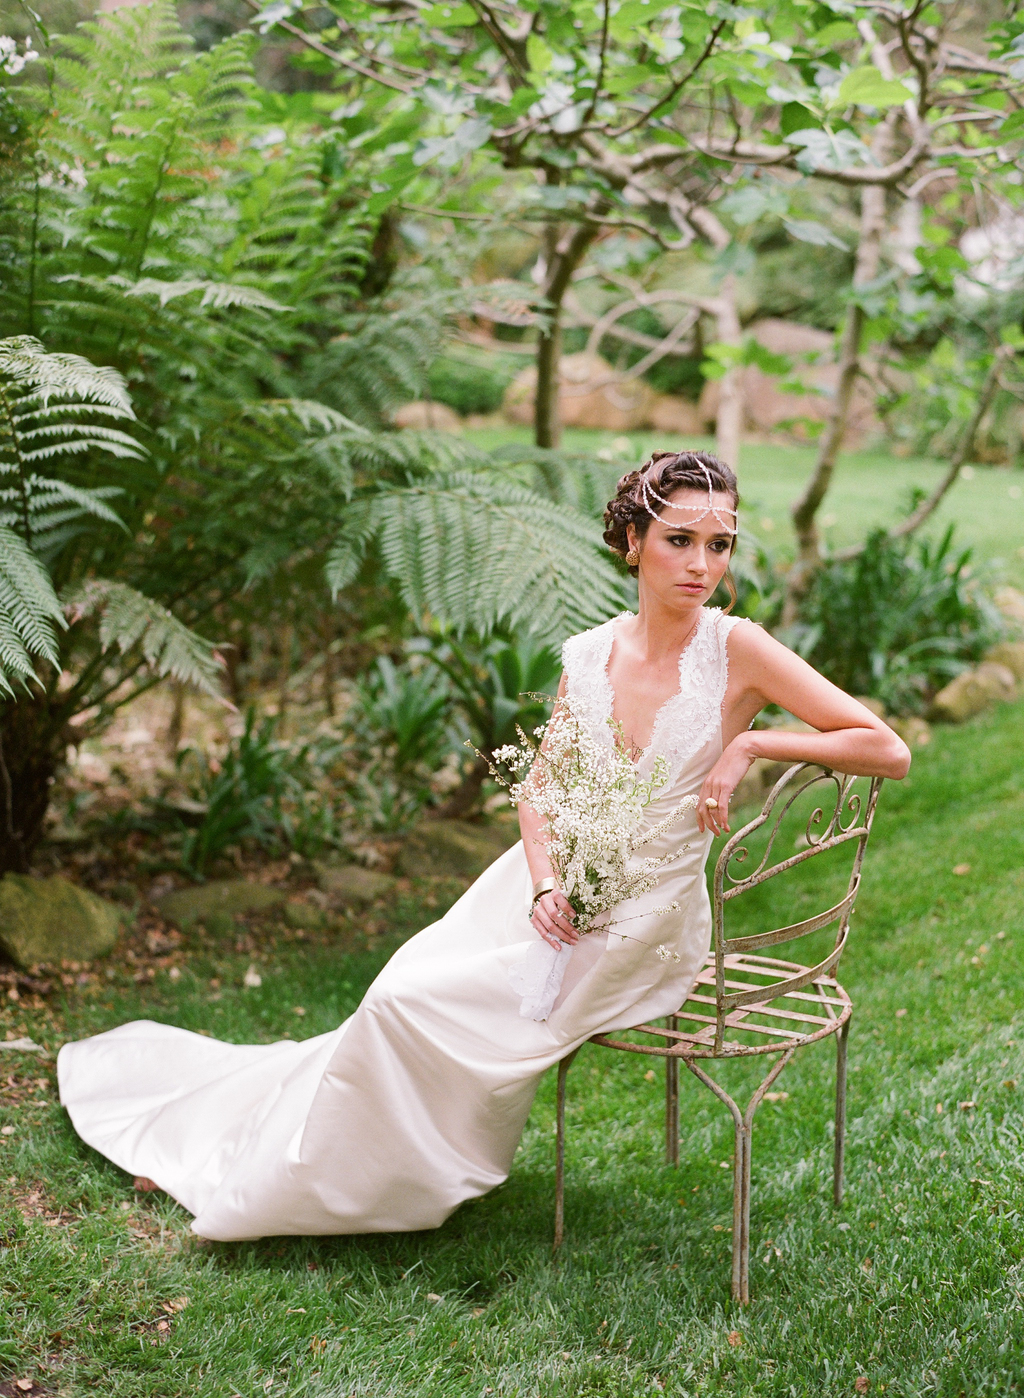 Styled-wedding-santa-barbara-chic-beaux-arts-photographie-italian-bohemian-wedding-bride-wedding-dress-lace-white-flowers-bouquet-031.full